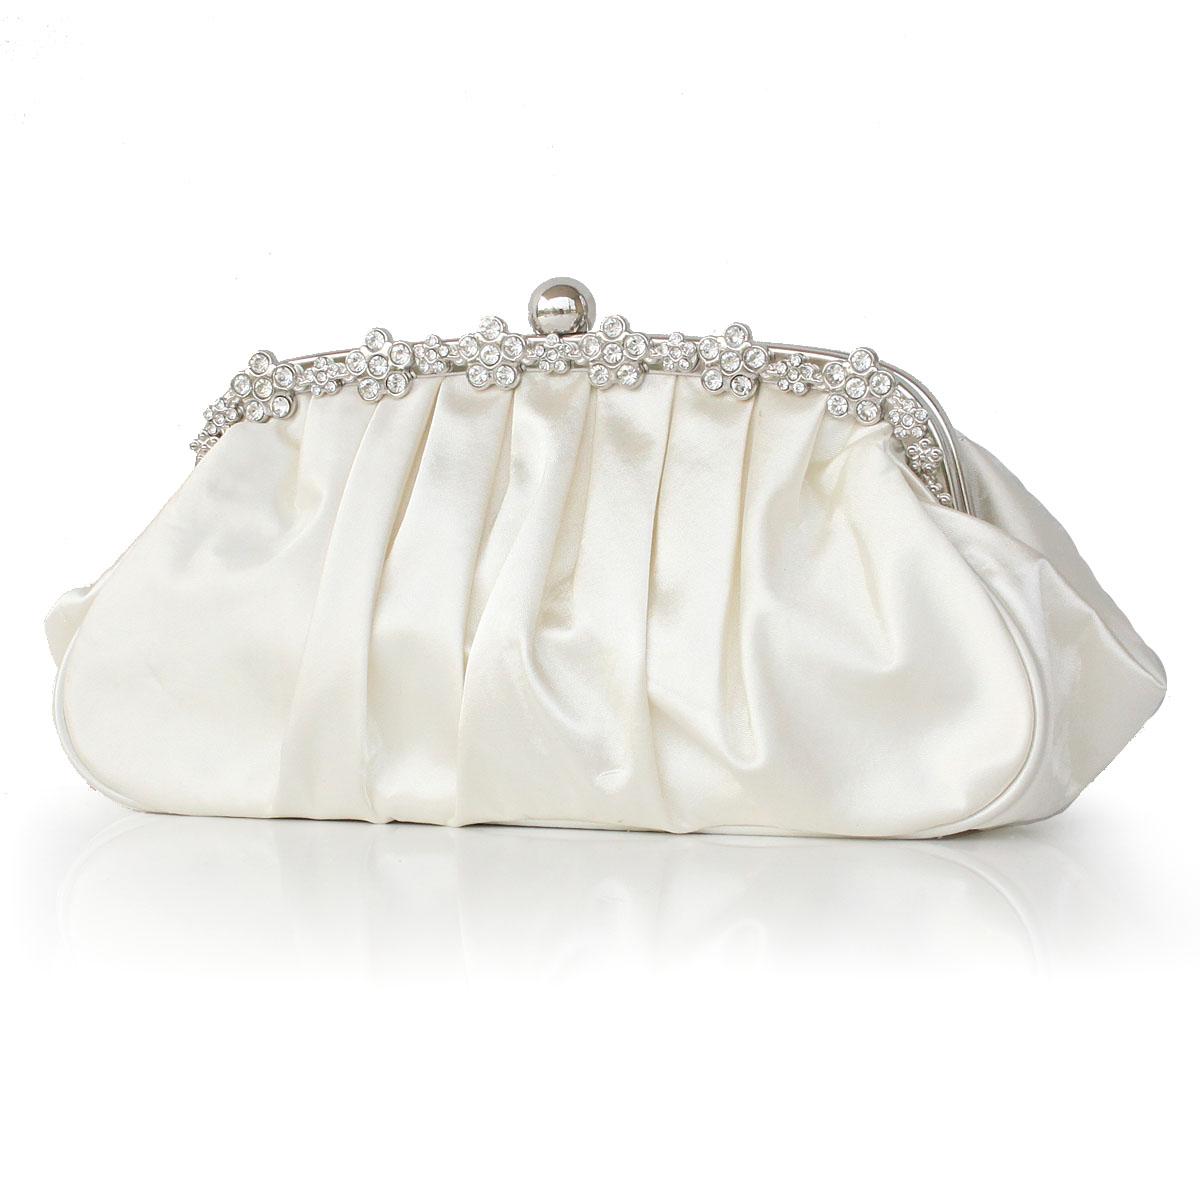 flip flops atlanta ga bar彩月C T新娘包嵌钻玫瑰花装饰铰口的